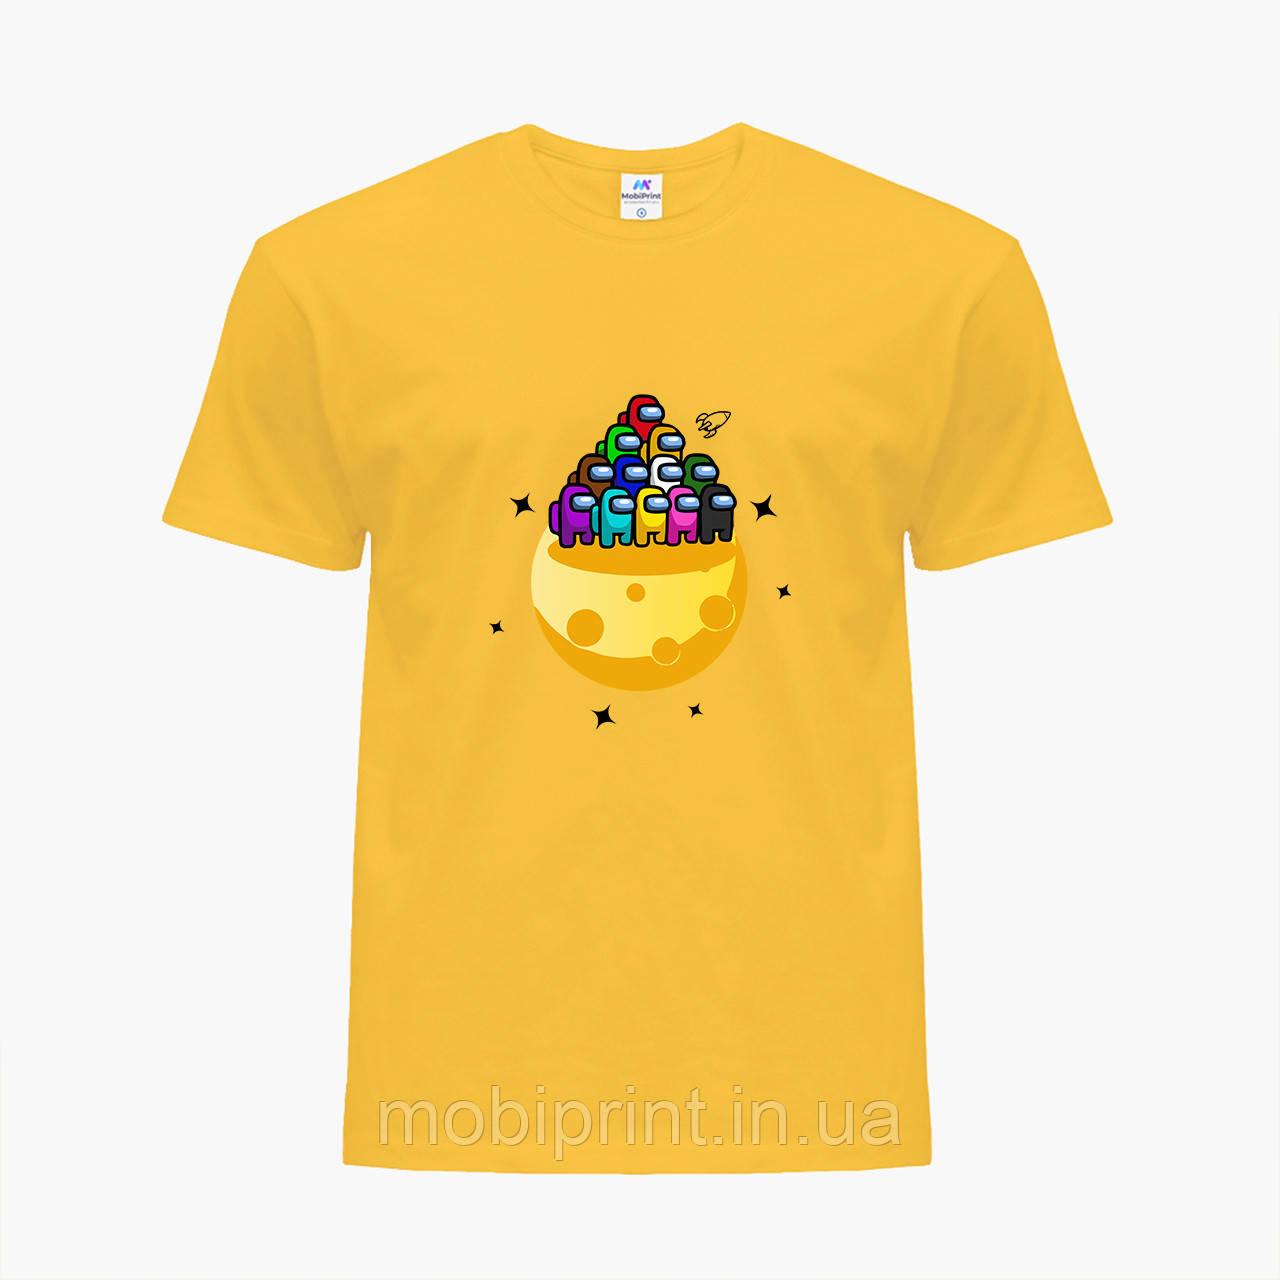 Дитяча футболка для хлопчиків Амонг Ас (Among Us) (25186-2584) Жовтий